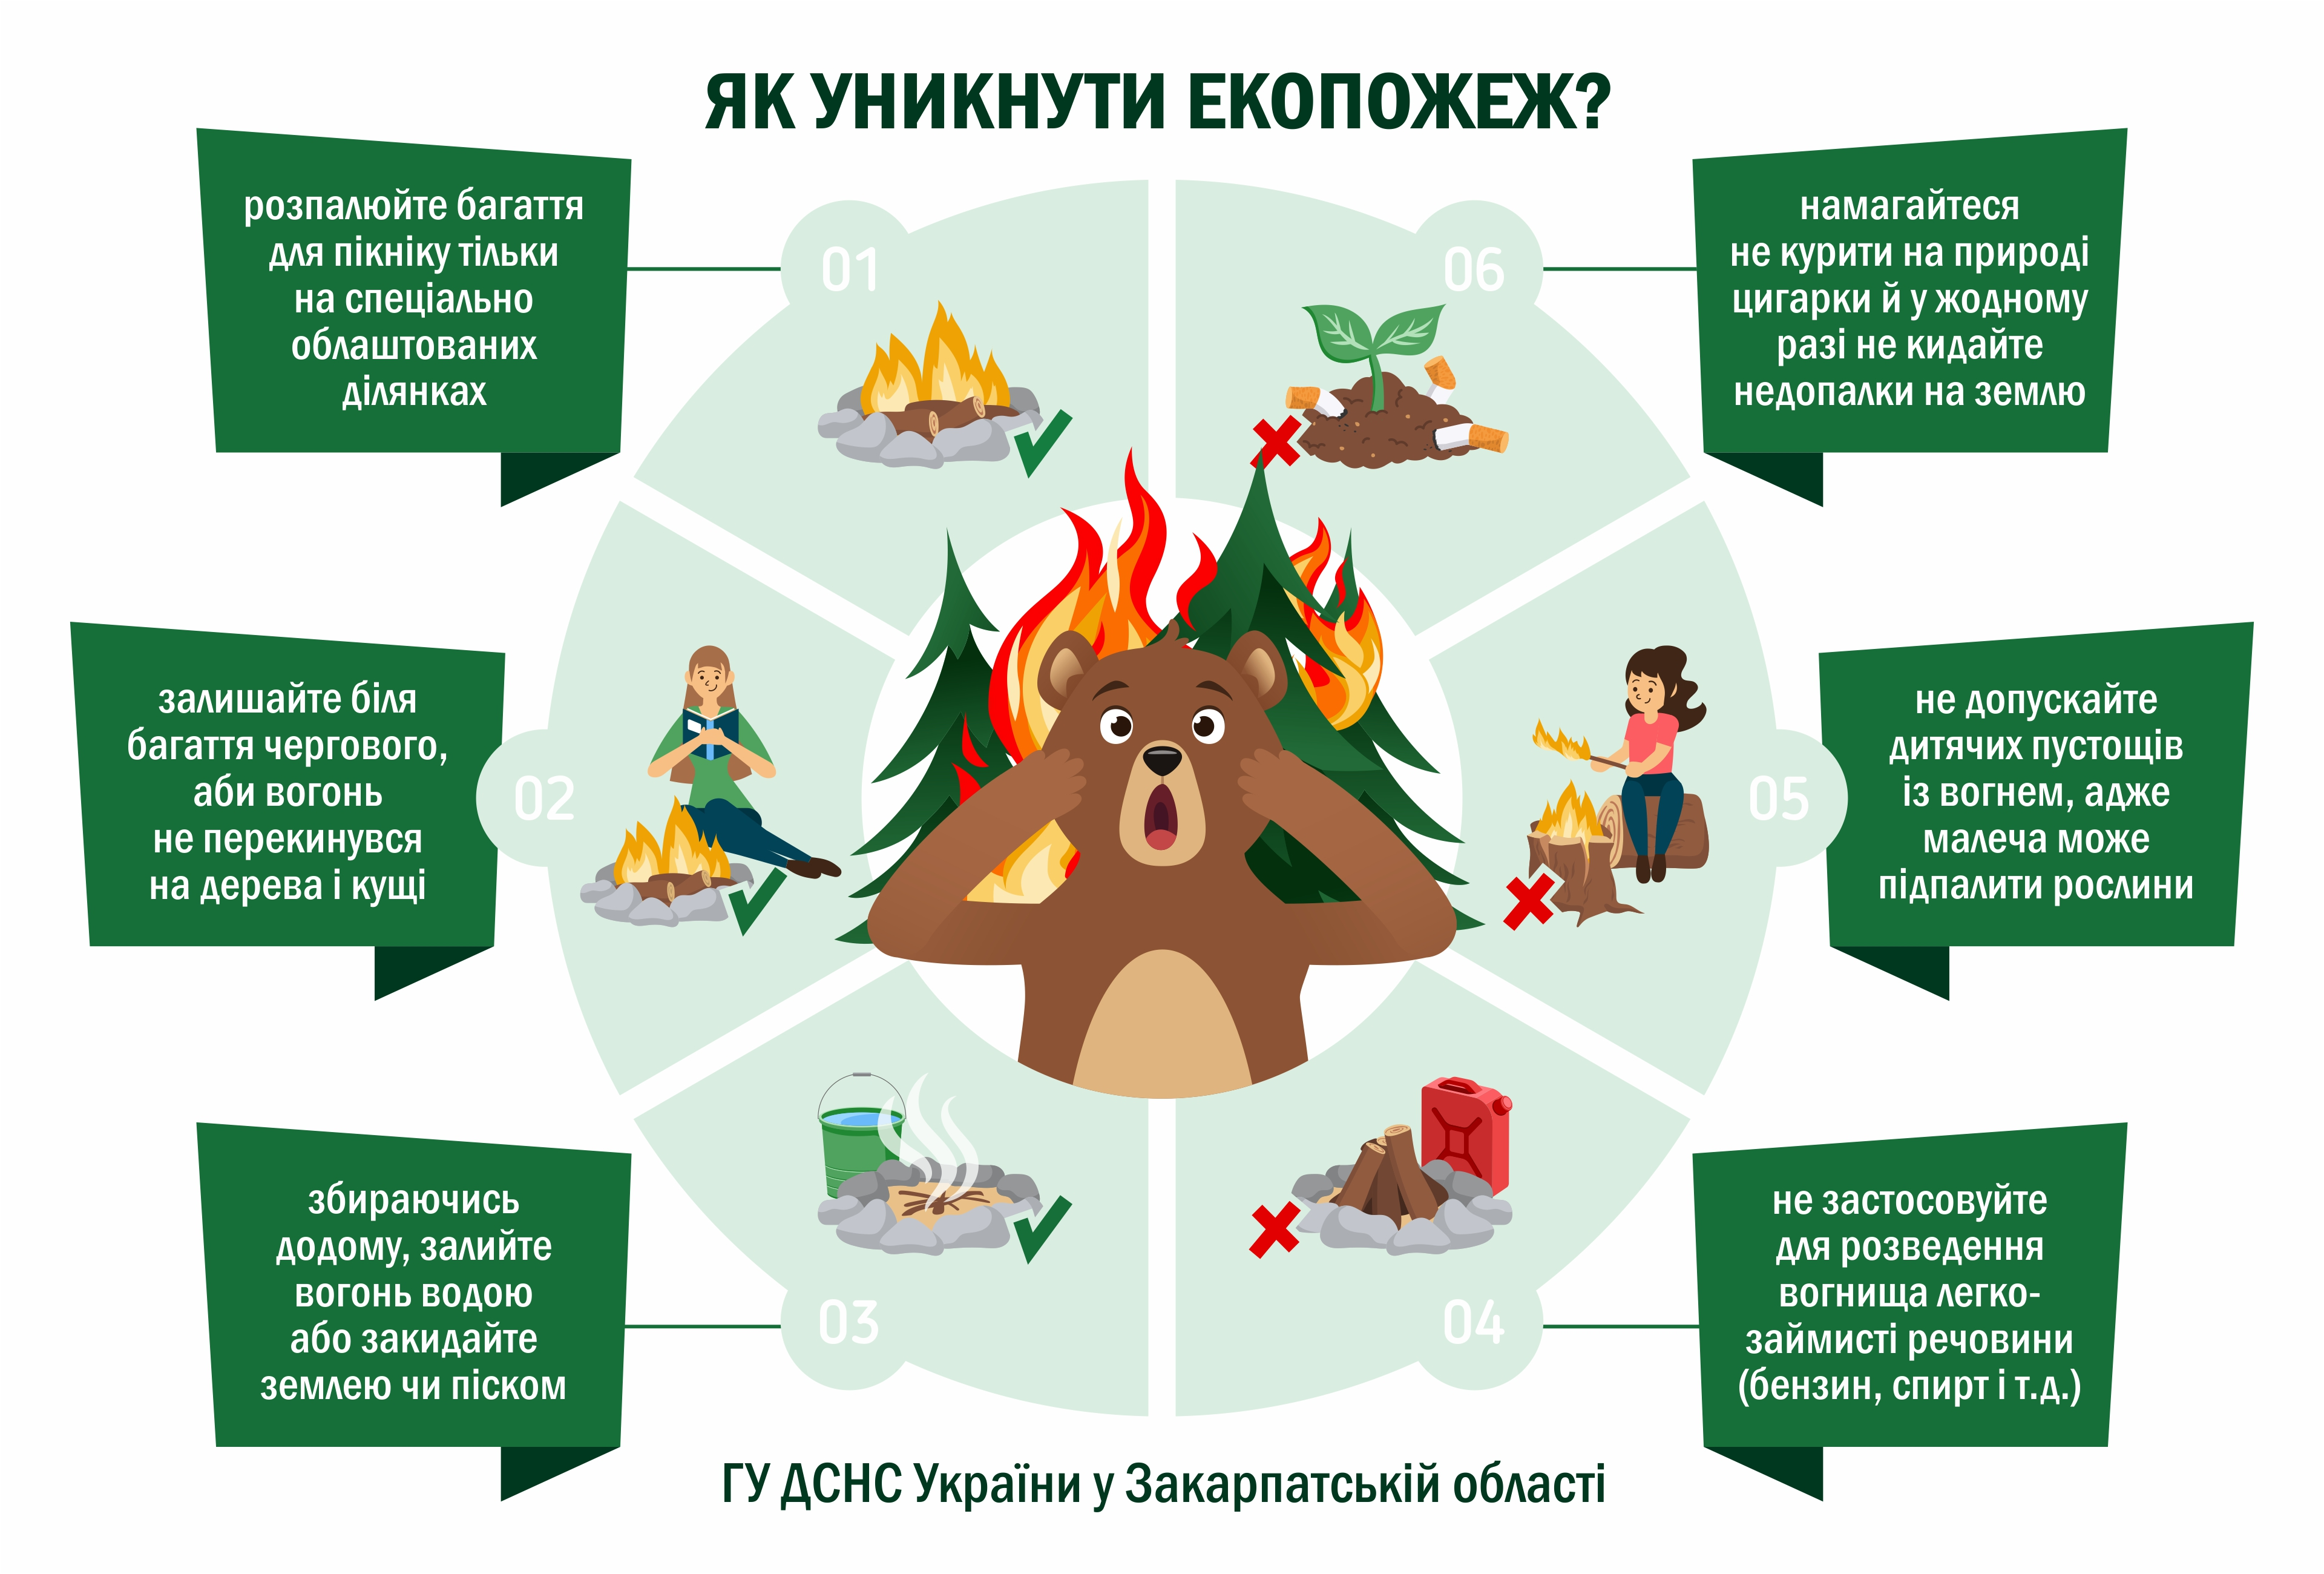 ekosystemy_bear_gu.jpg